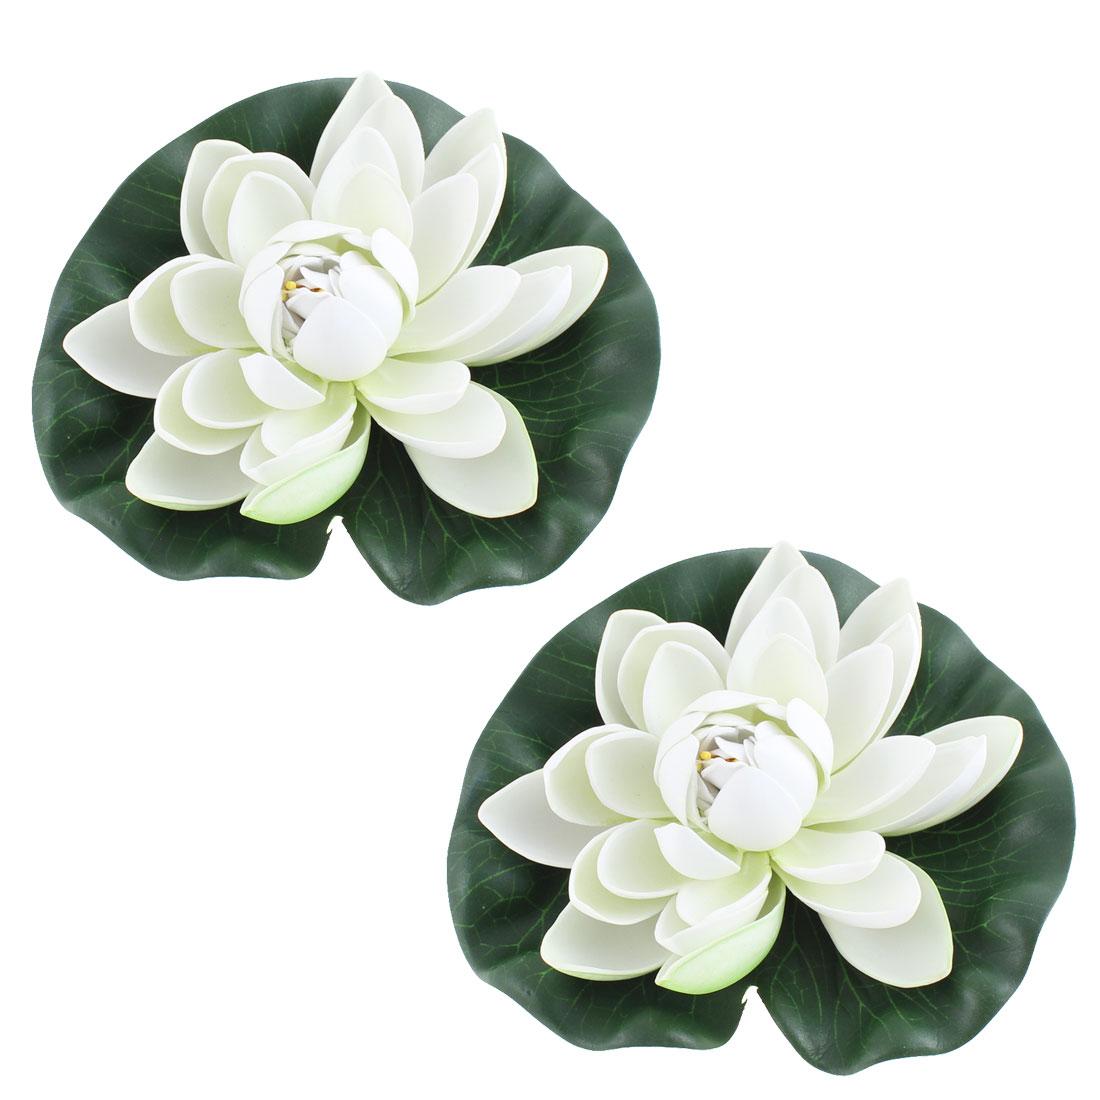 Aquarium Fish Tank Artificial Floating Lotus Flower Ornament 2 Pcs Green White